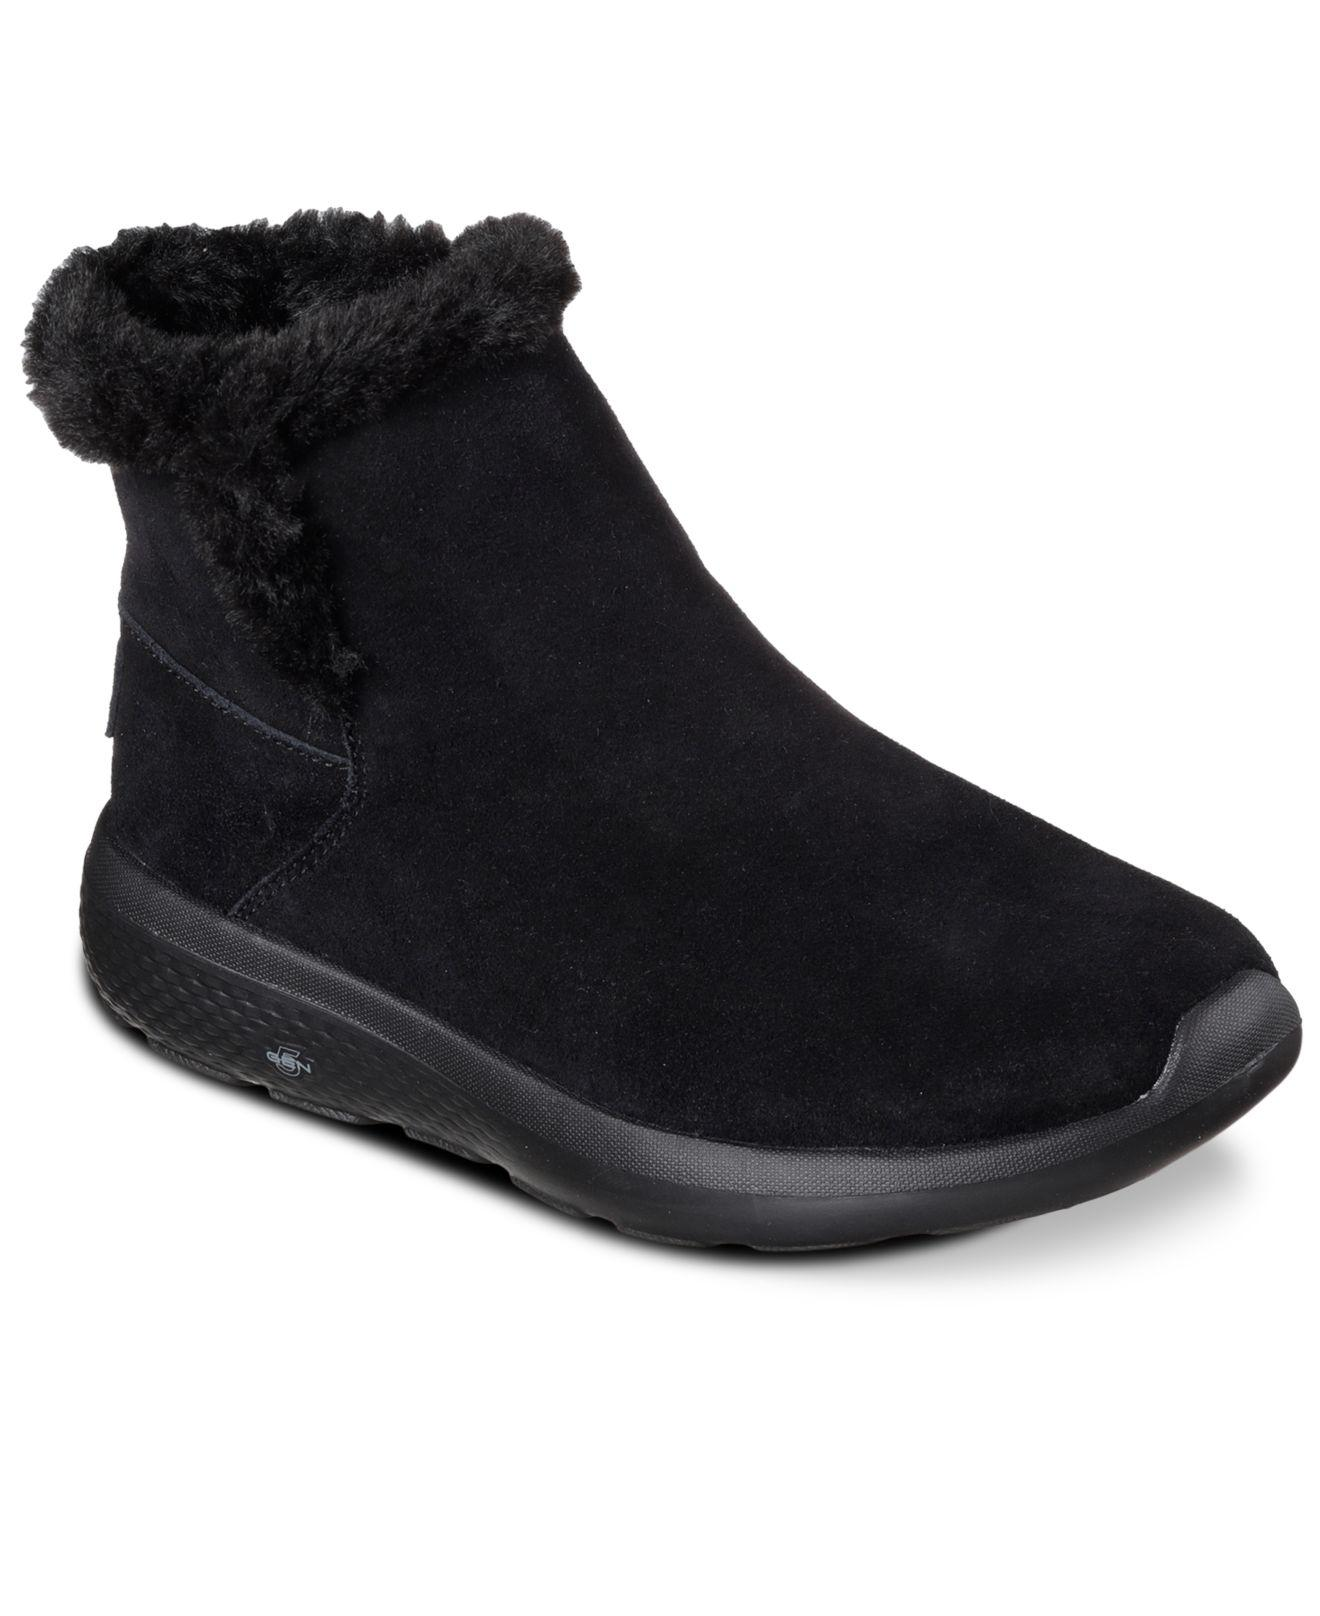 Skechers. Black Women's On The Go: City 2 - Bundle Boots ...